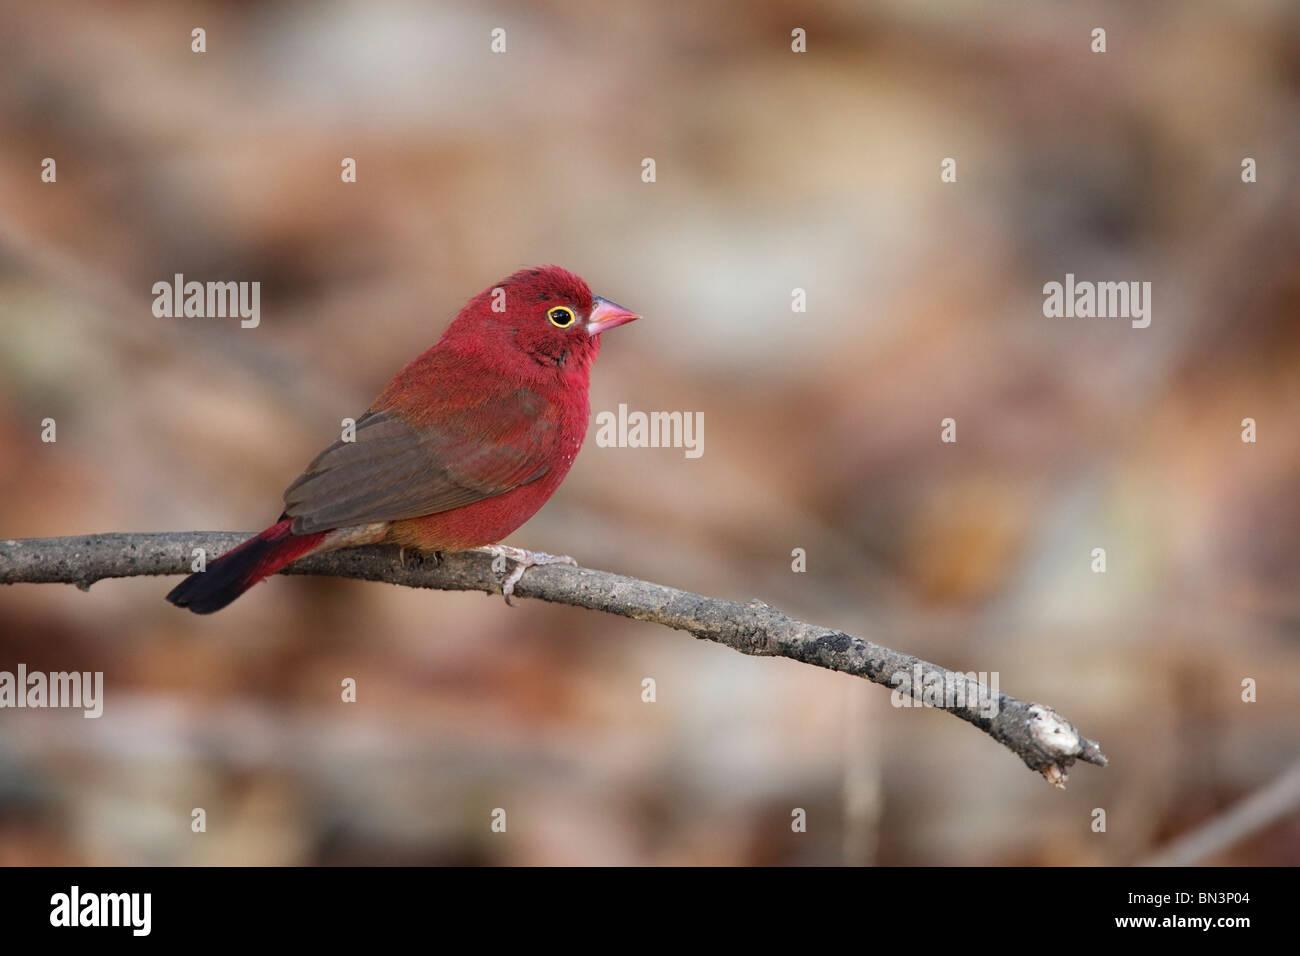 Red-billed Firefinch, Lagonosticta senegala, Gambia, West Africa, Africa Stock Photo